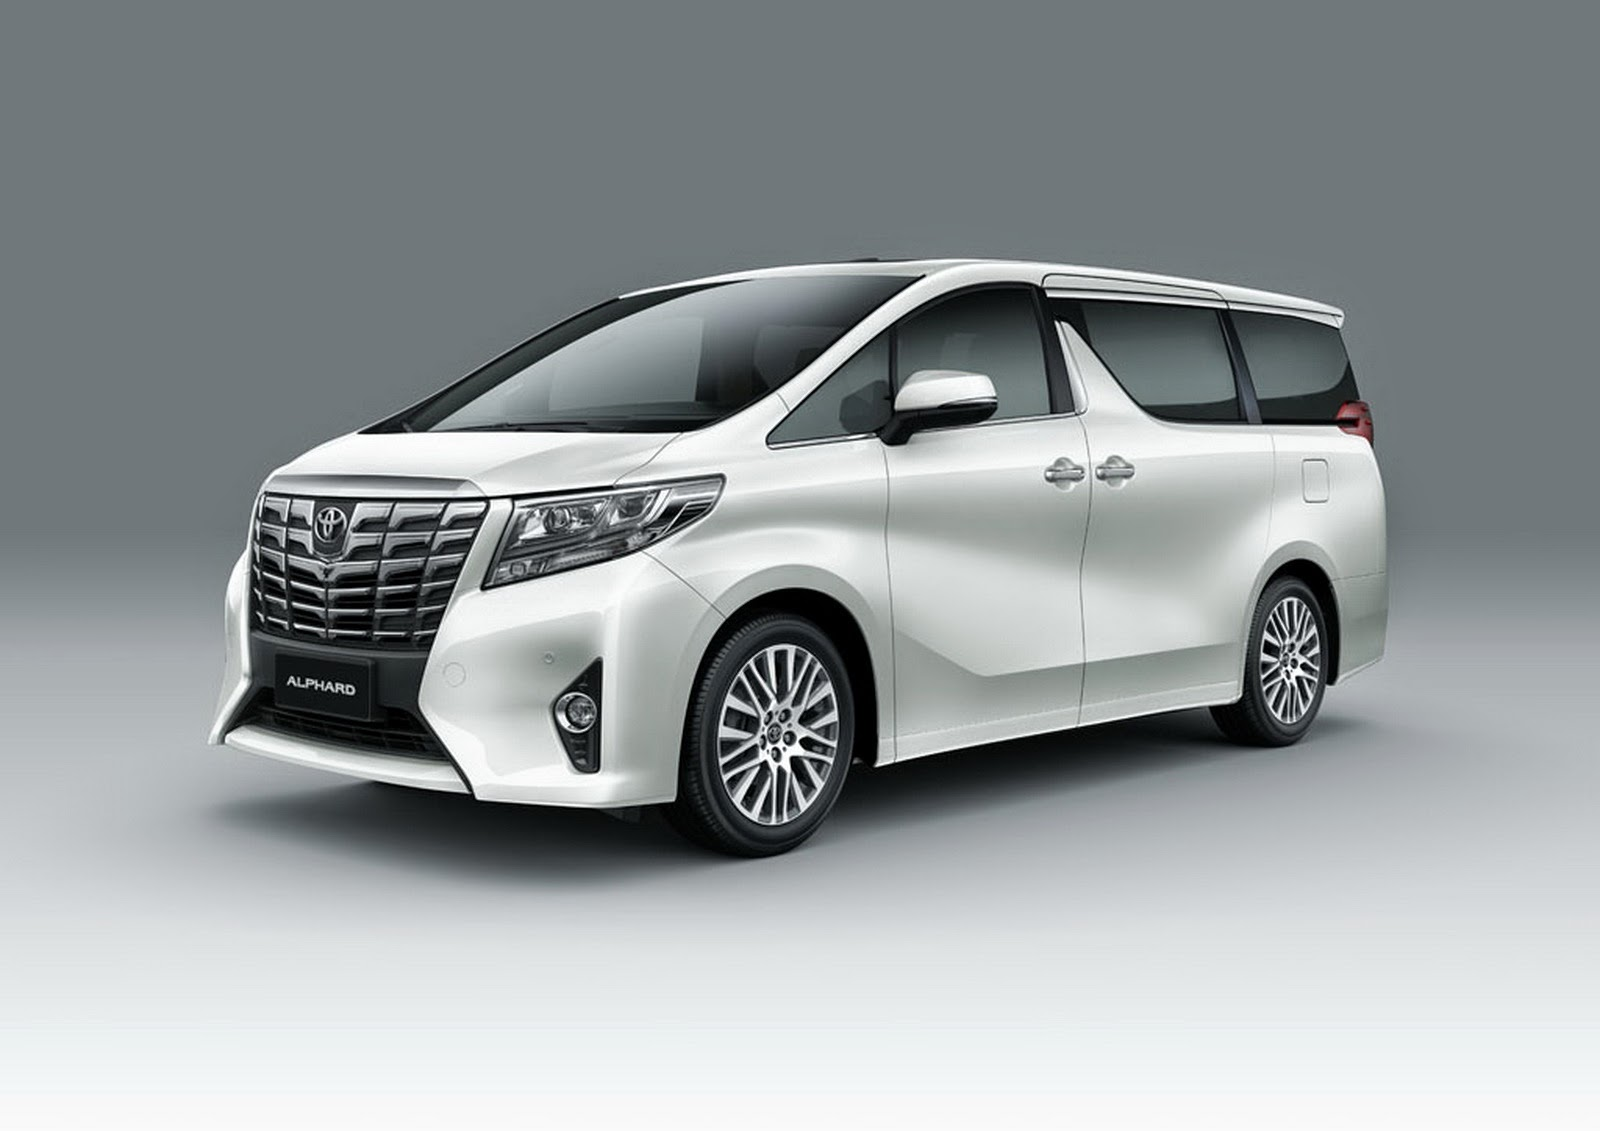 Alphard Toyota